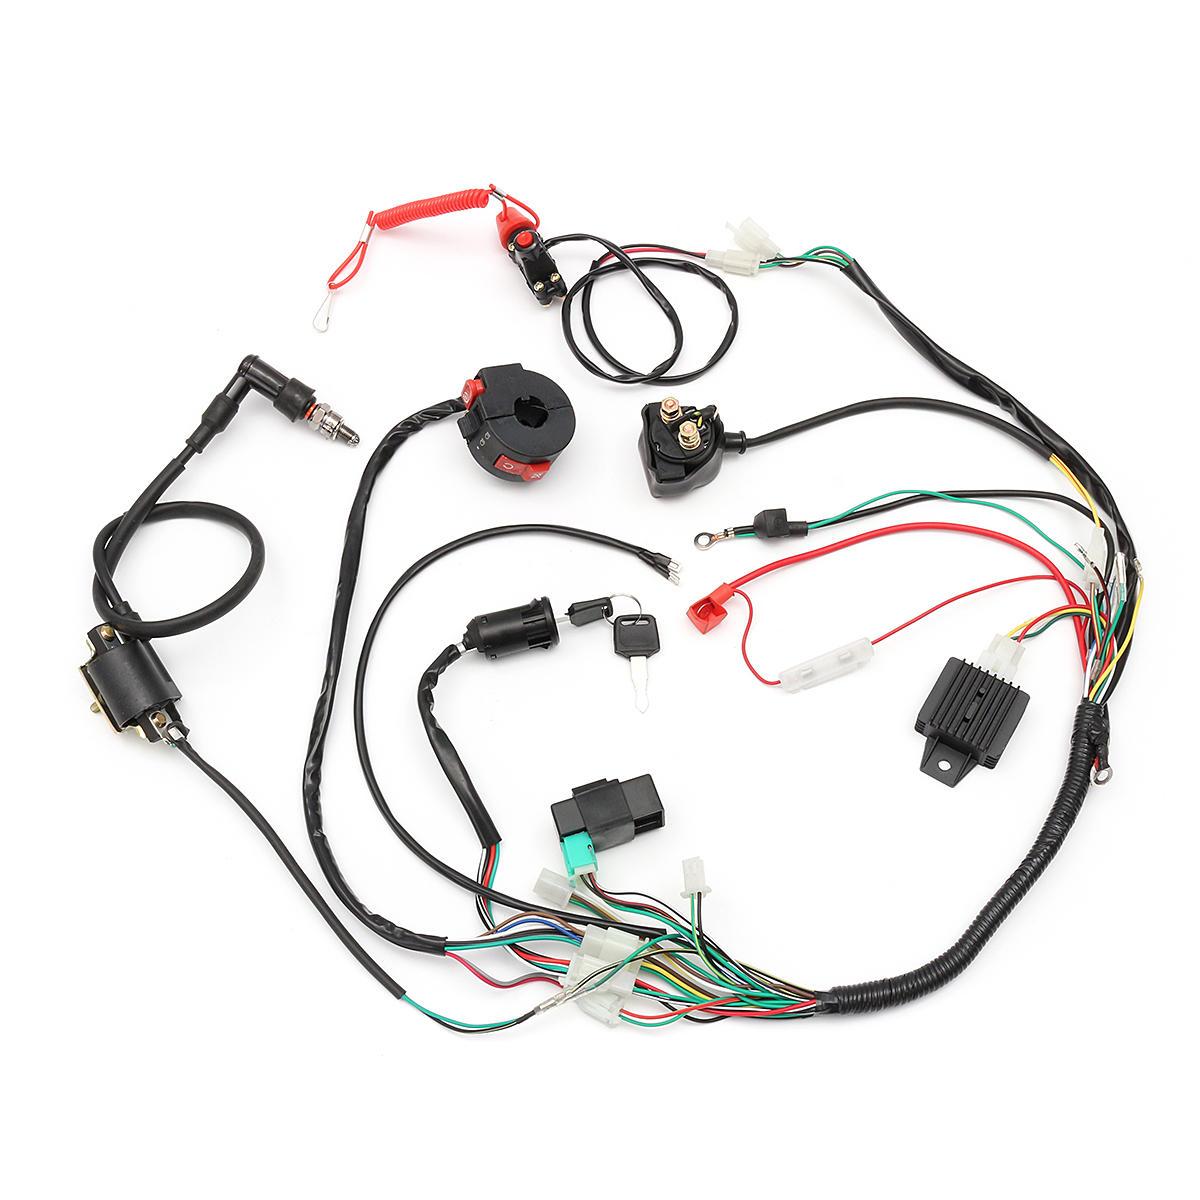 hight resolution of wiring harness loom solenoid coil rectifier cdi 50cc 70cc 110cc cdi wiring harness